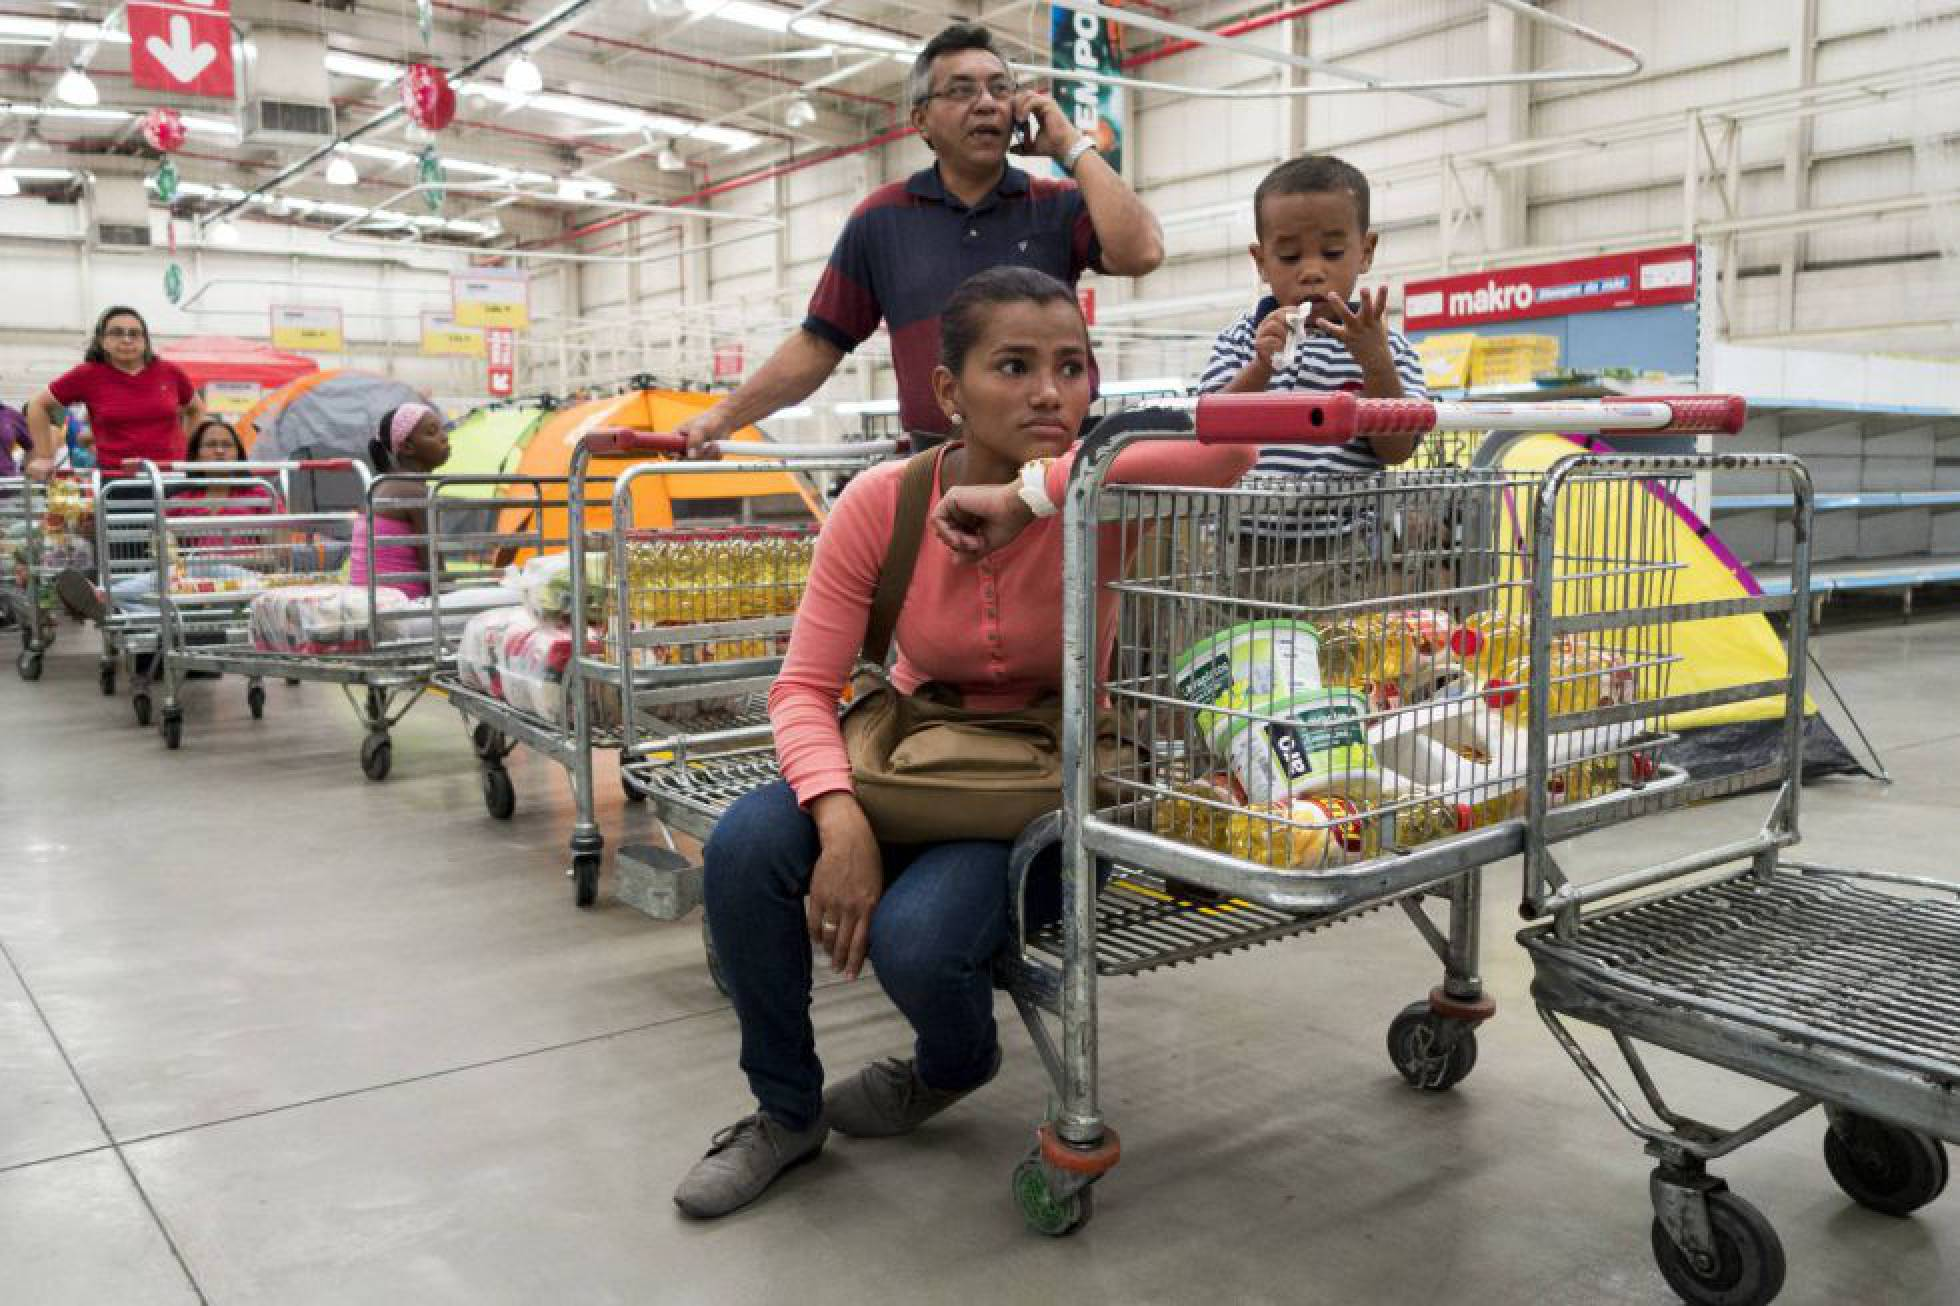 familia venezolana comprando viveres